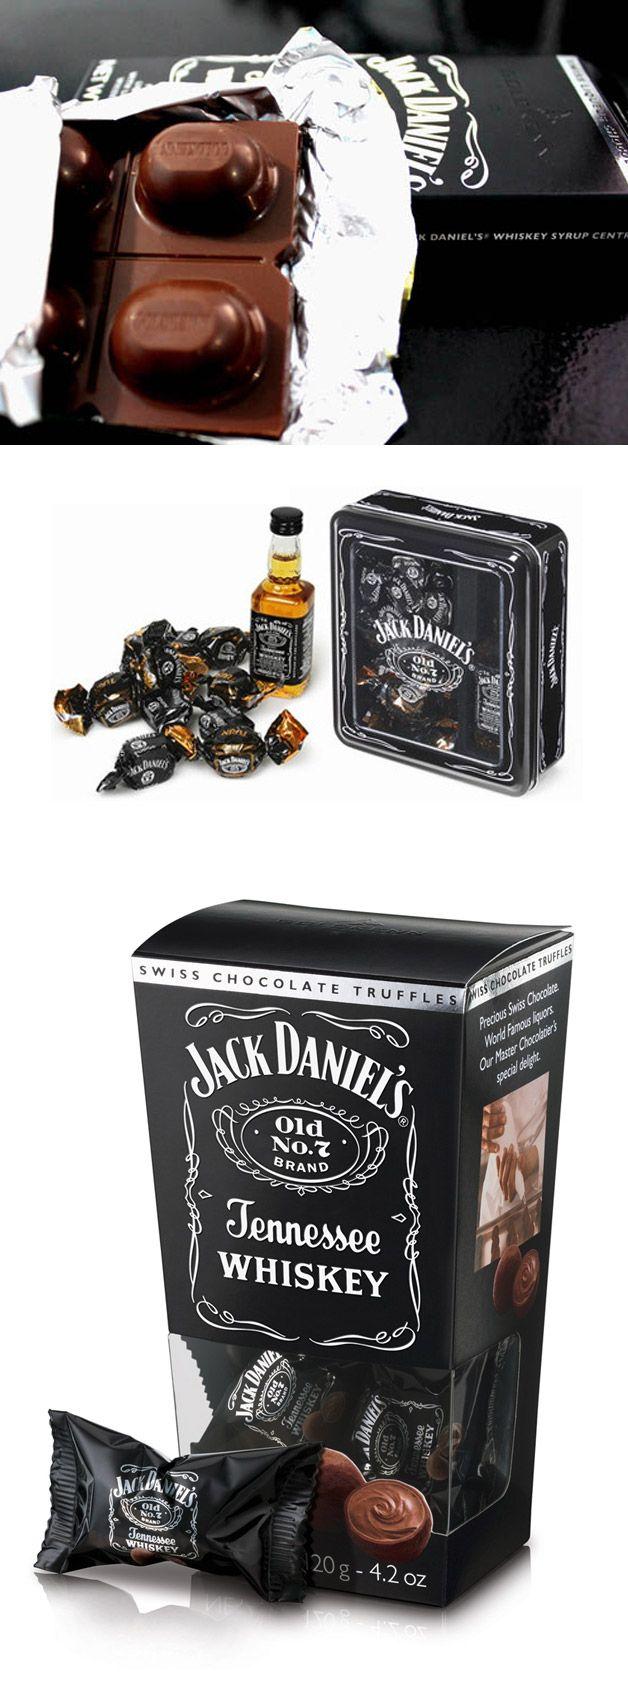 Simple ideas always the best.  Jack Daniels Chocolate! Mmmm chocolate PD